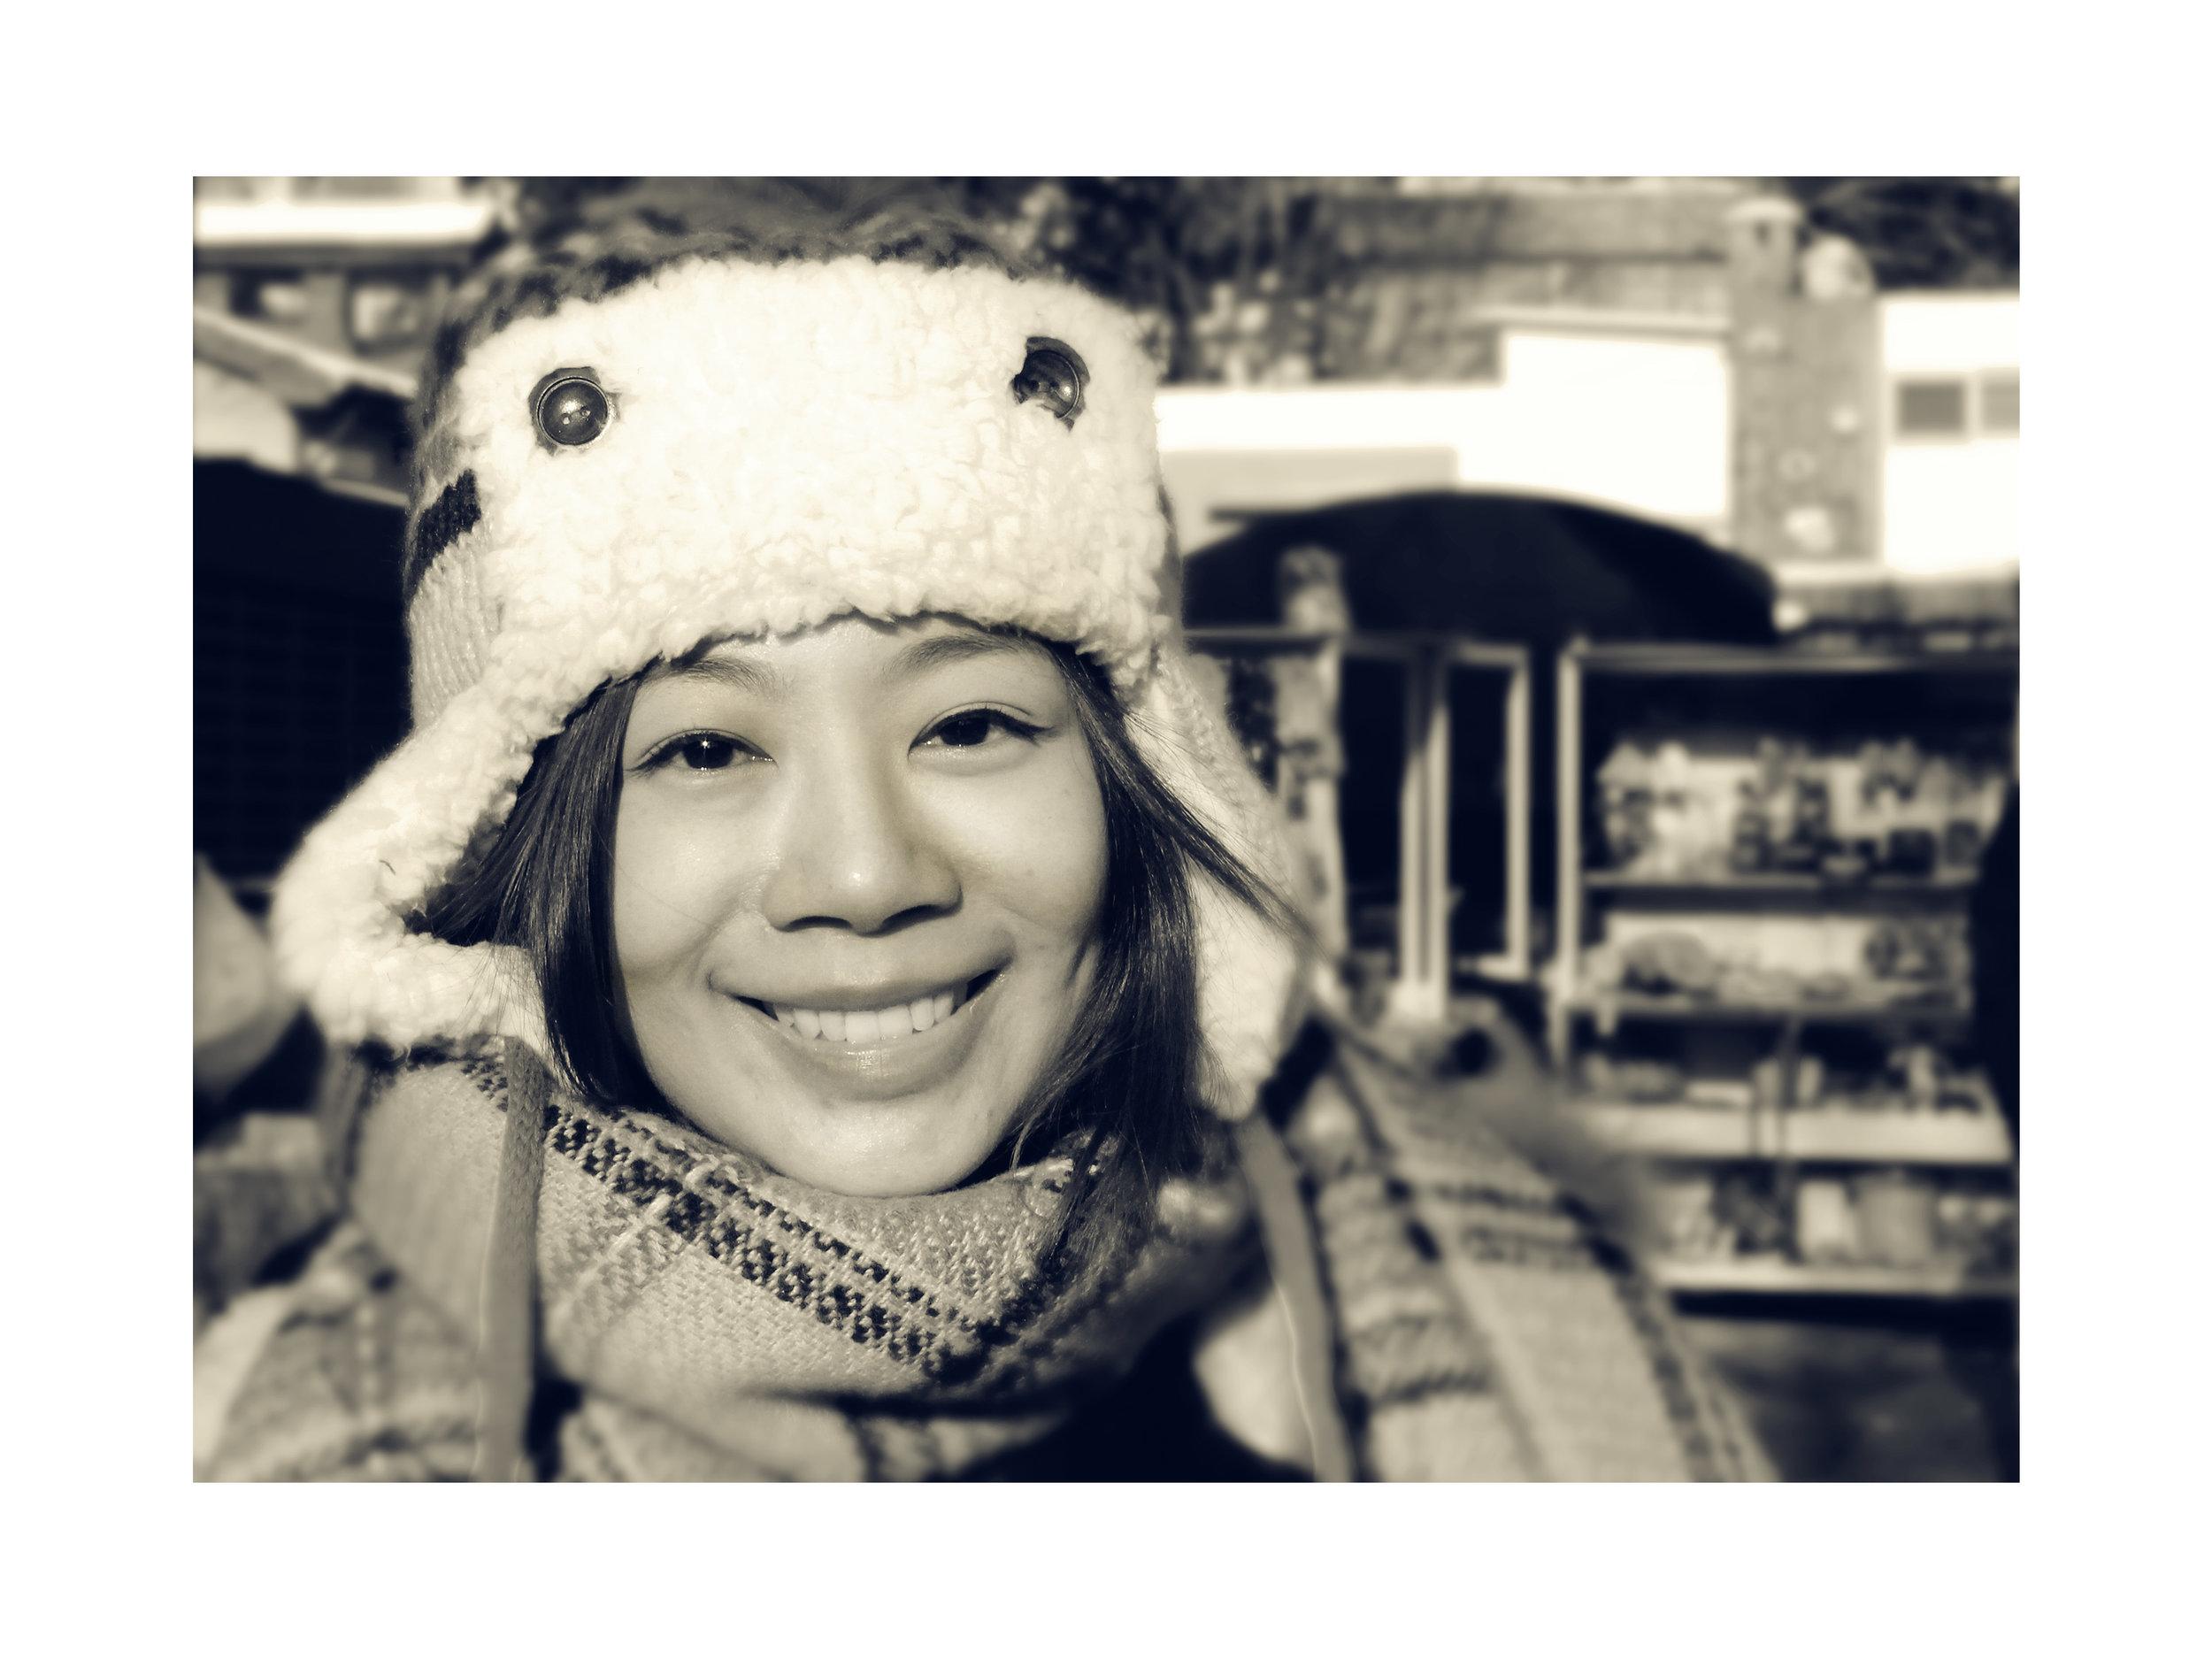 JW_face VI_013.jpg